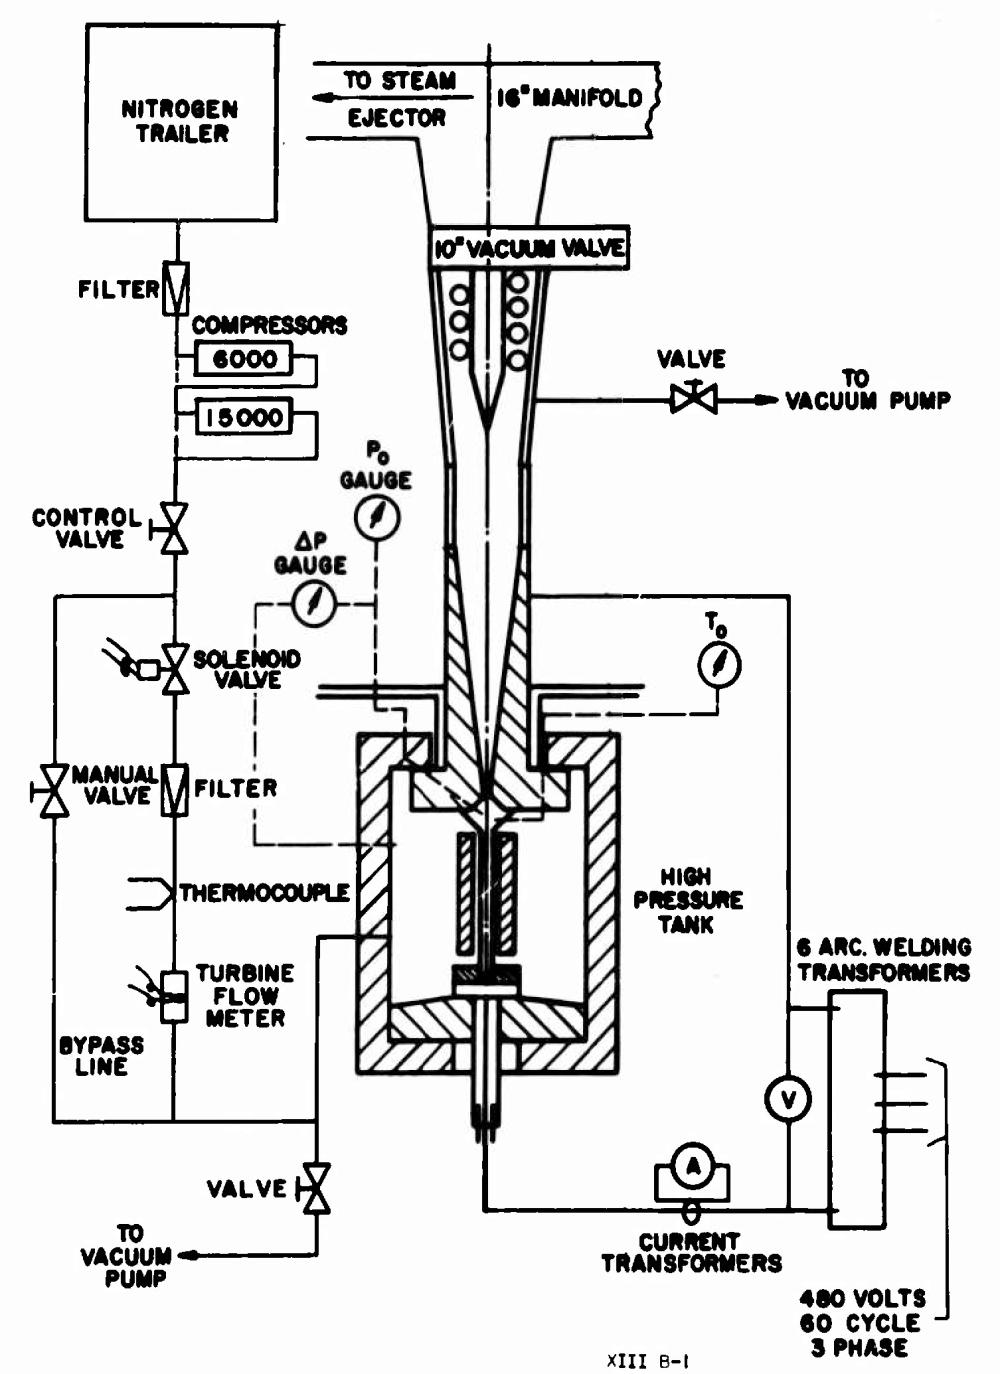 medium resolution of figure i line diagram uf the high pressure high temperature nitrogen facility